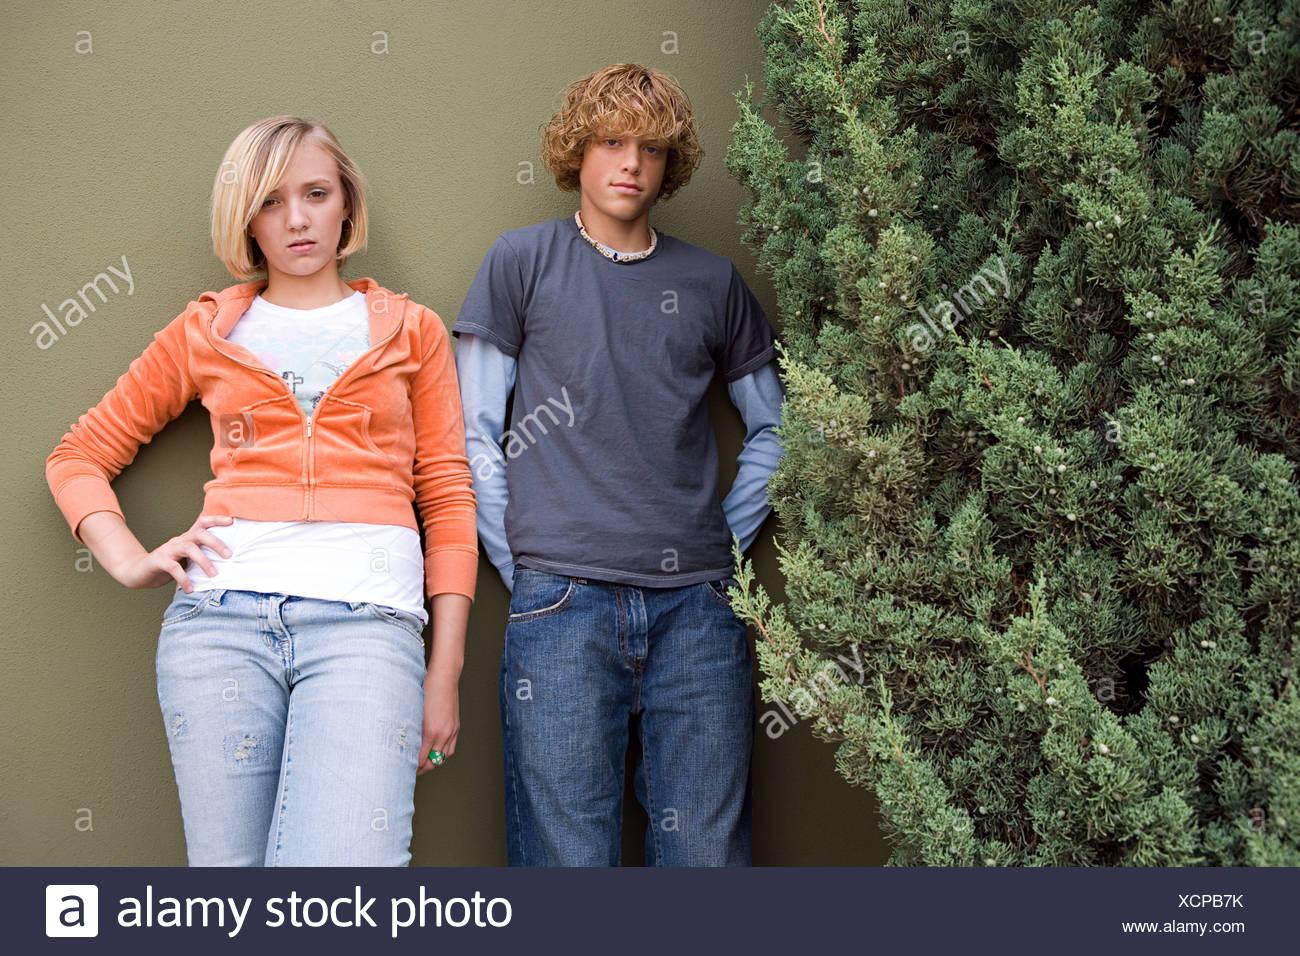 Teenage couple stood outdoors - Stock Image